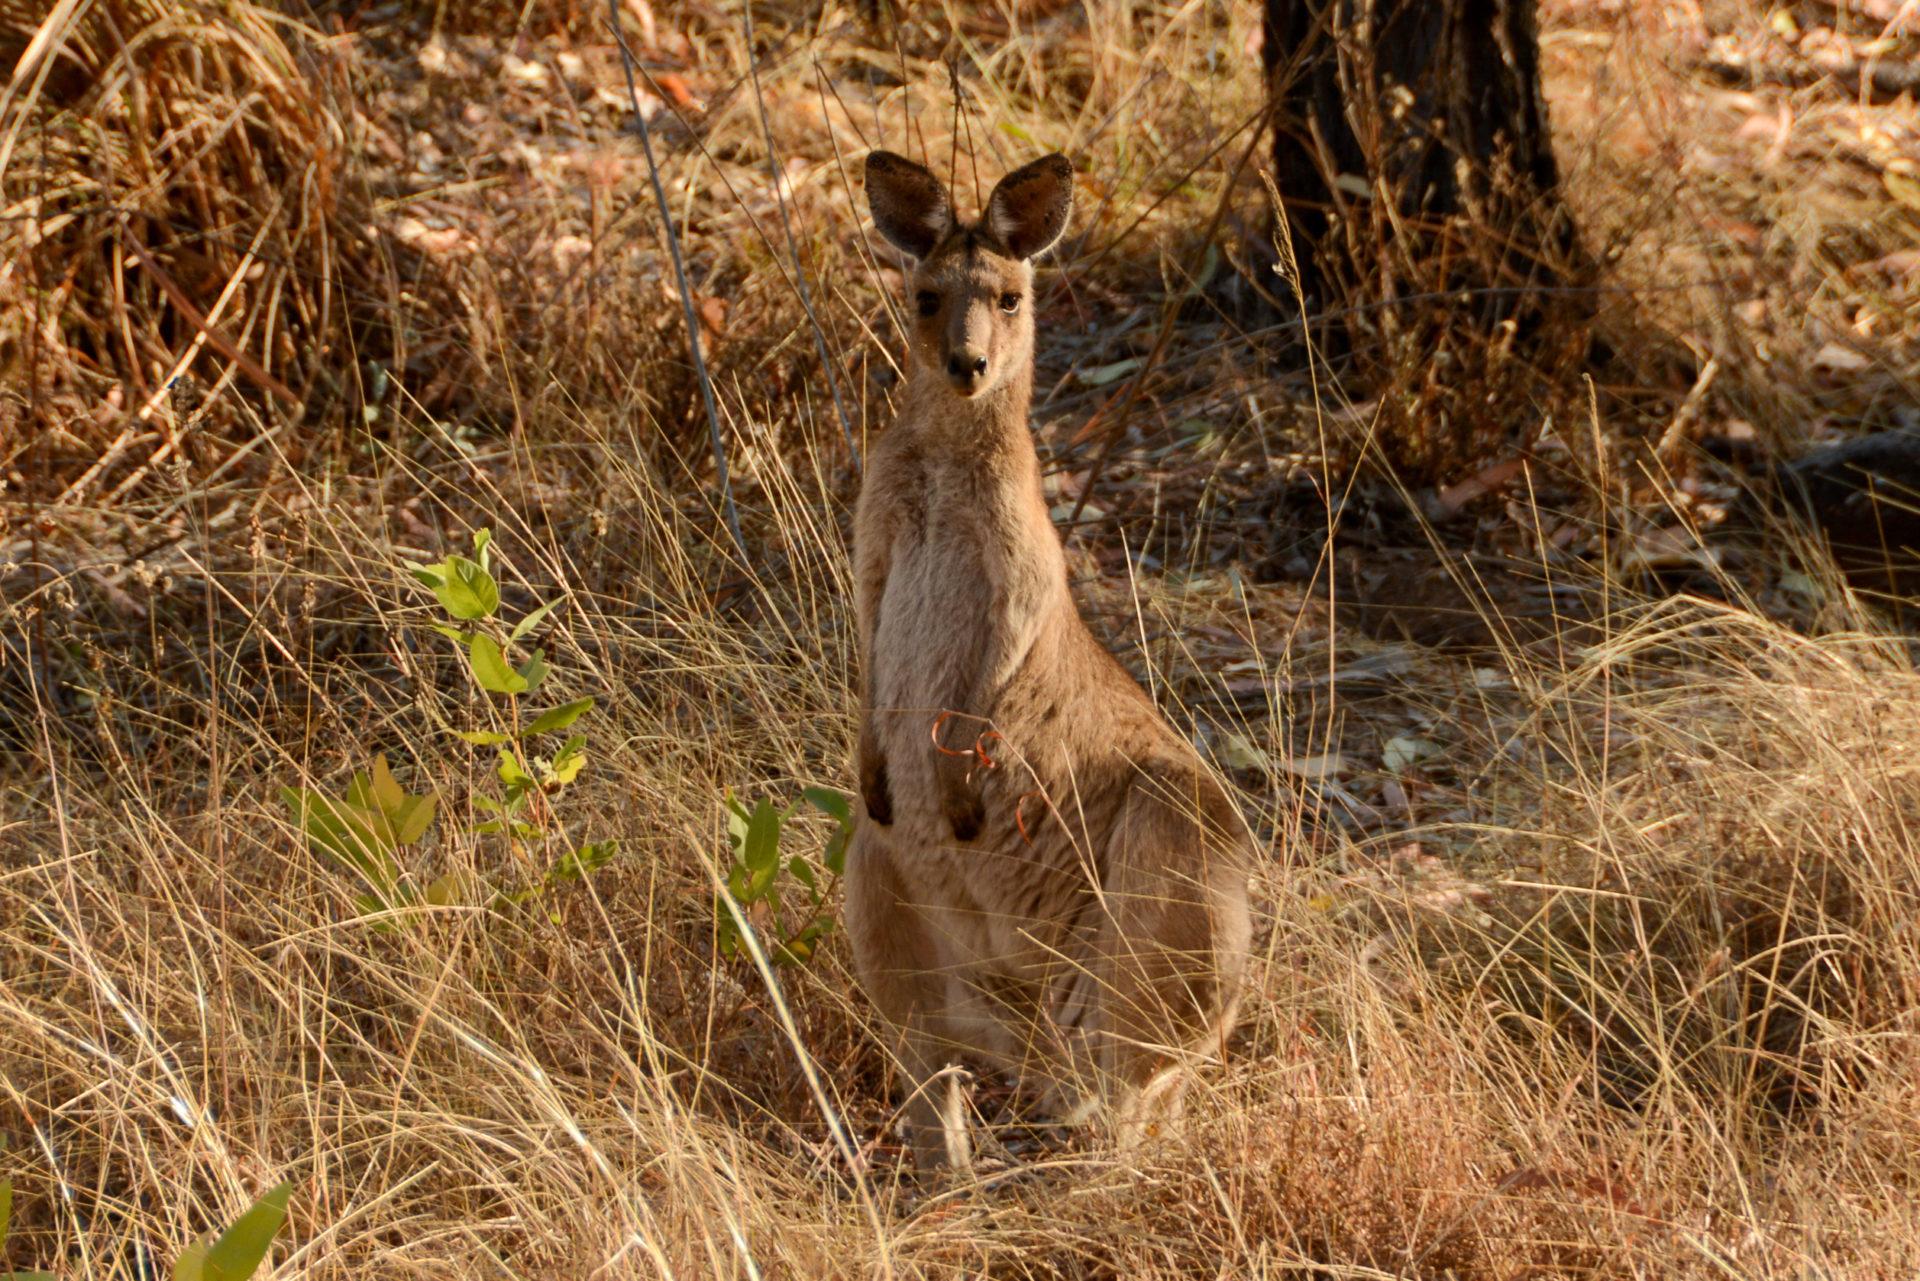 Känguruh schaut neugierig in die Kamera